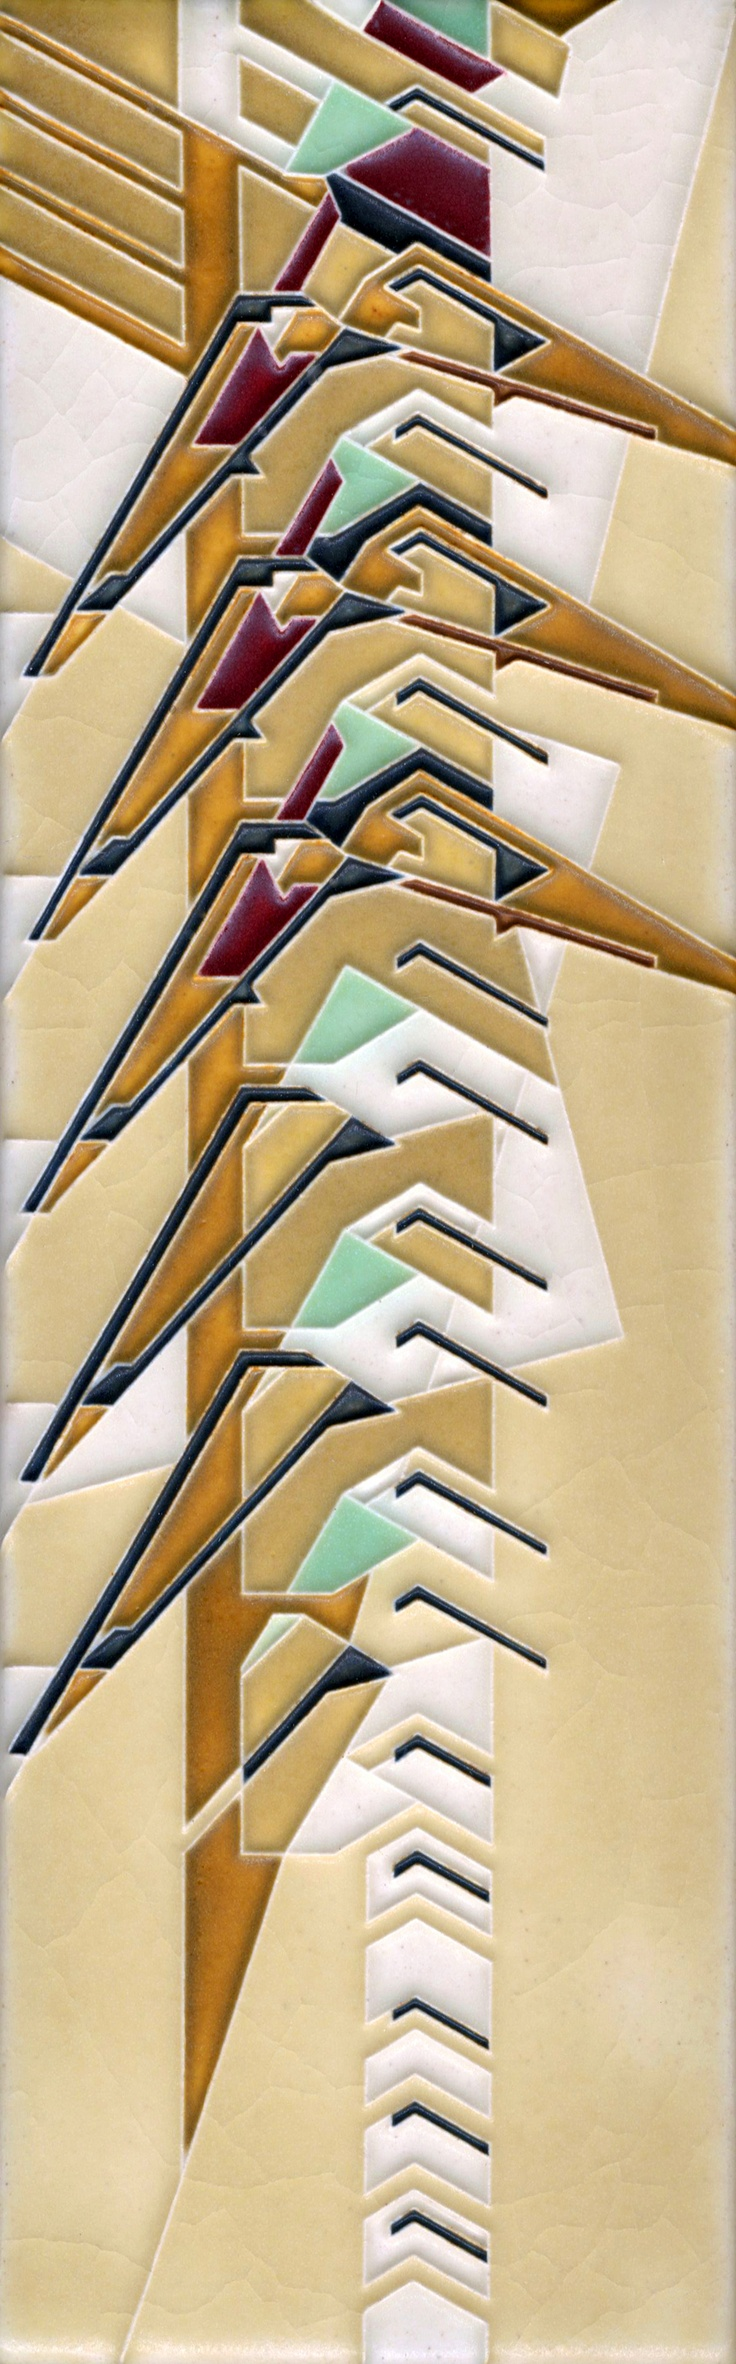 4x12 Christian House Rug By Motawi Tileworks (Frank Lloyd Wright Design)